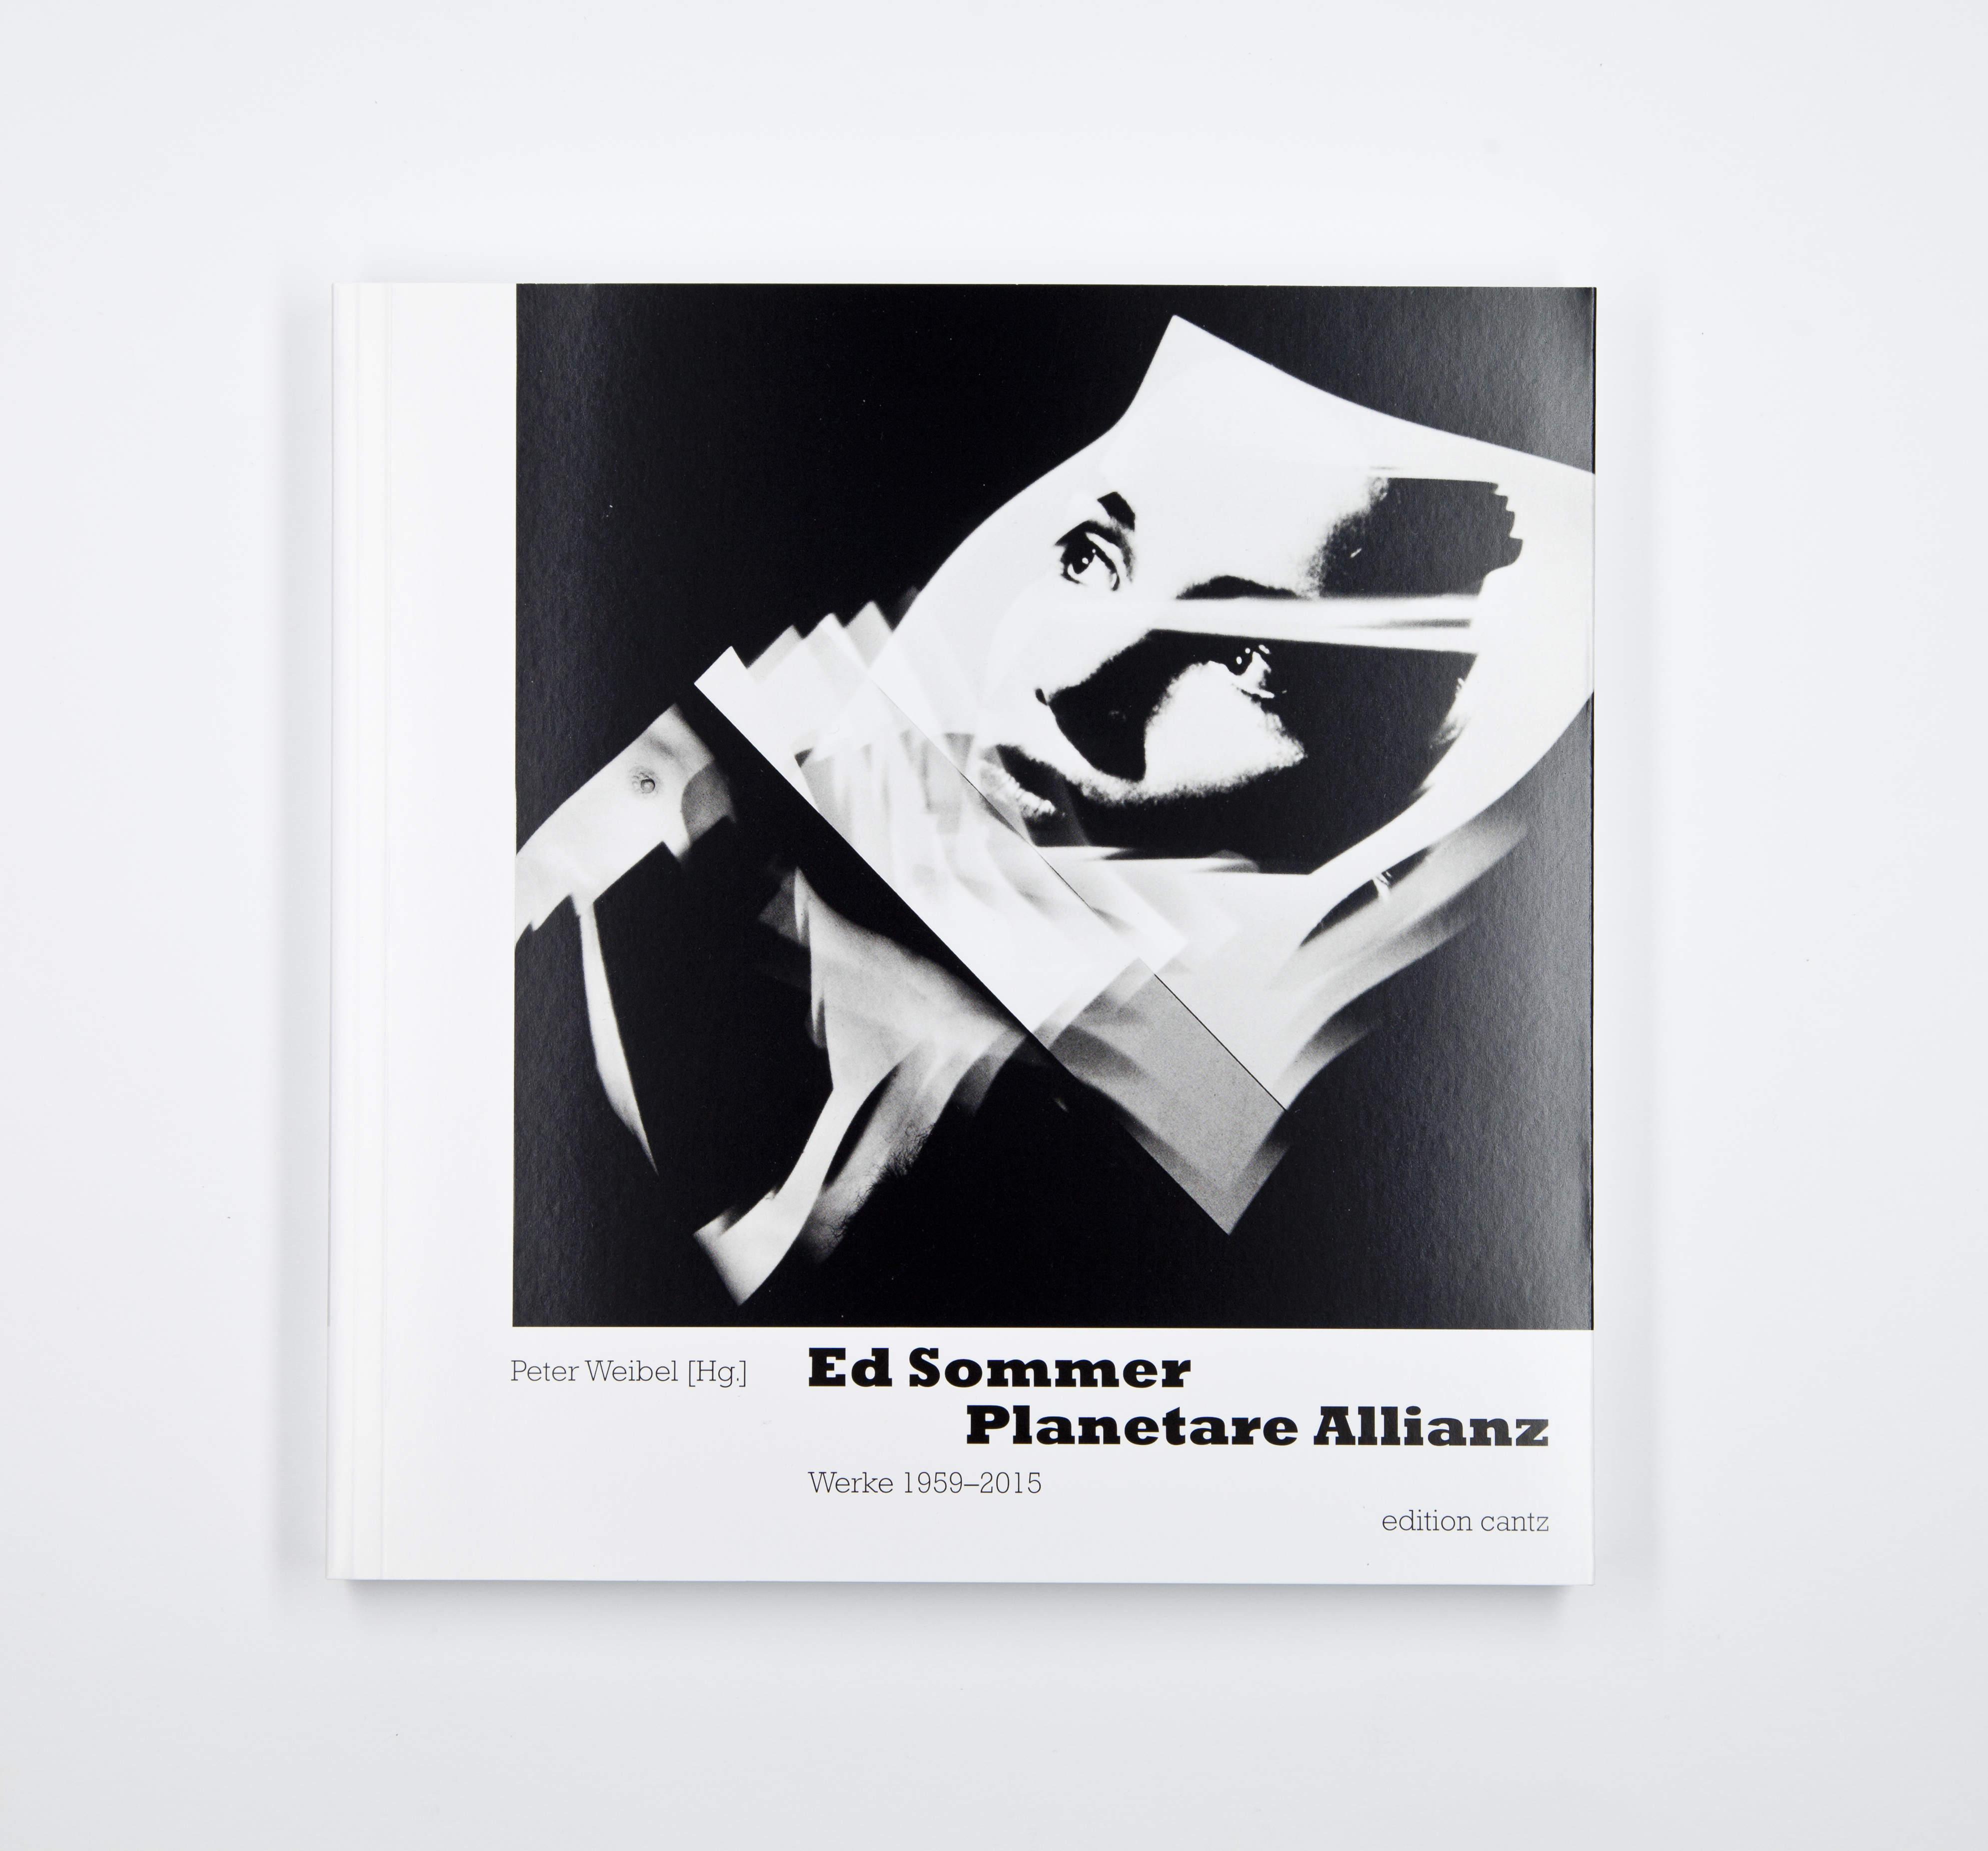 Ed Sommer. Planetare Allianz